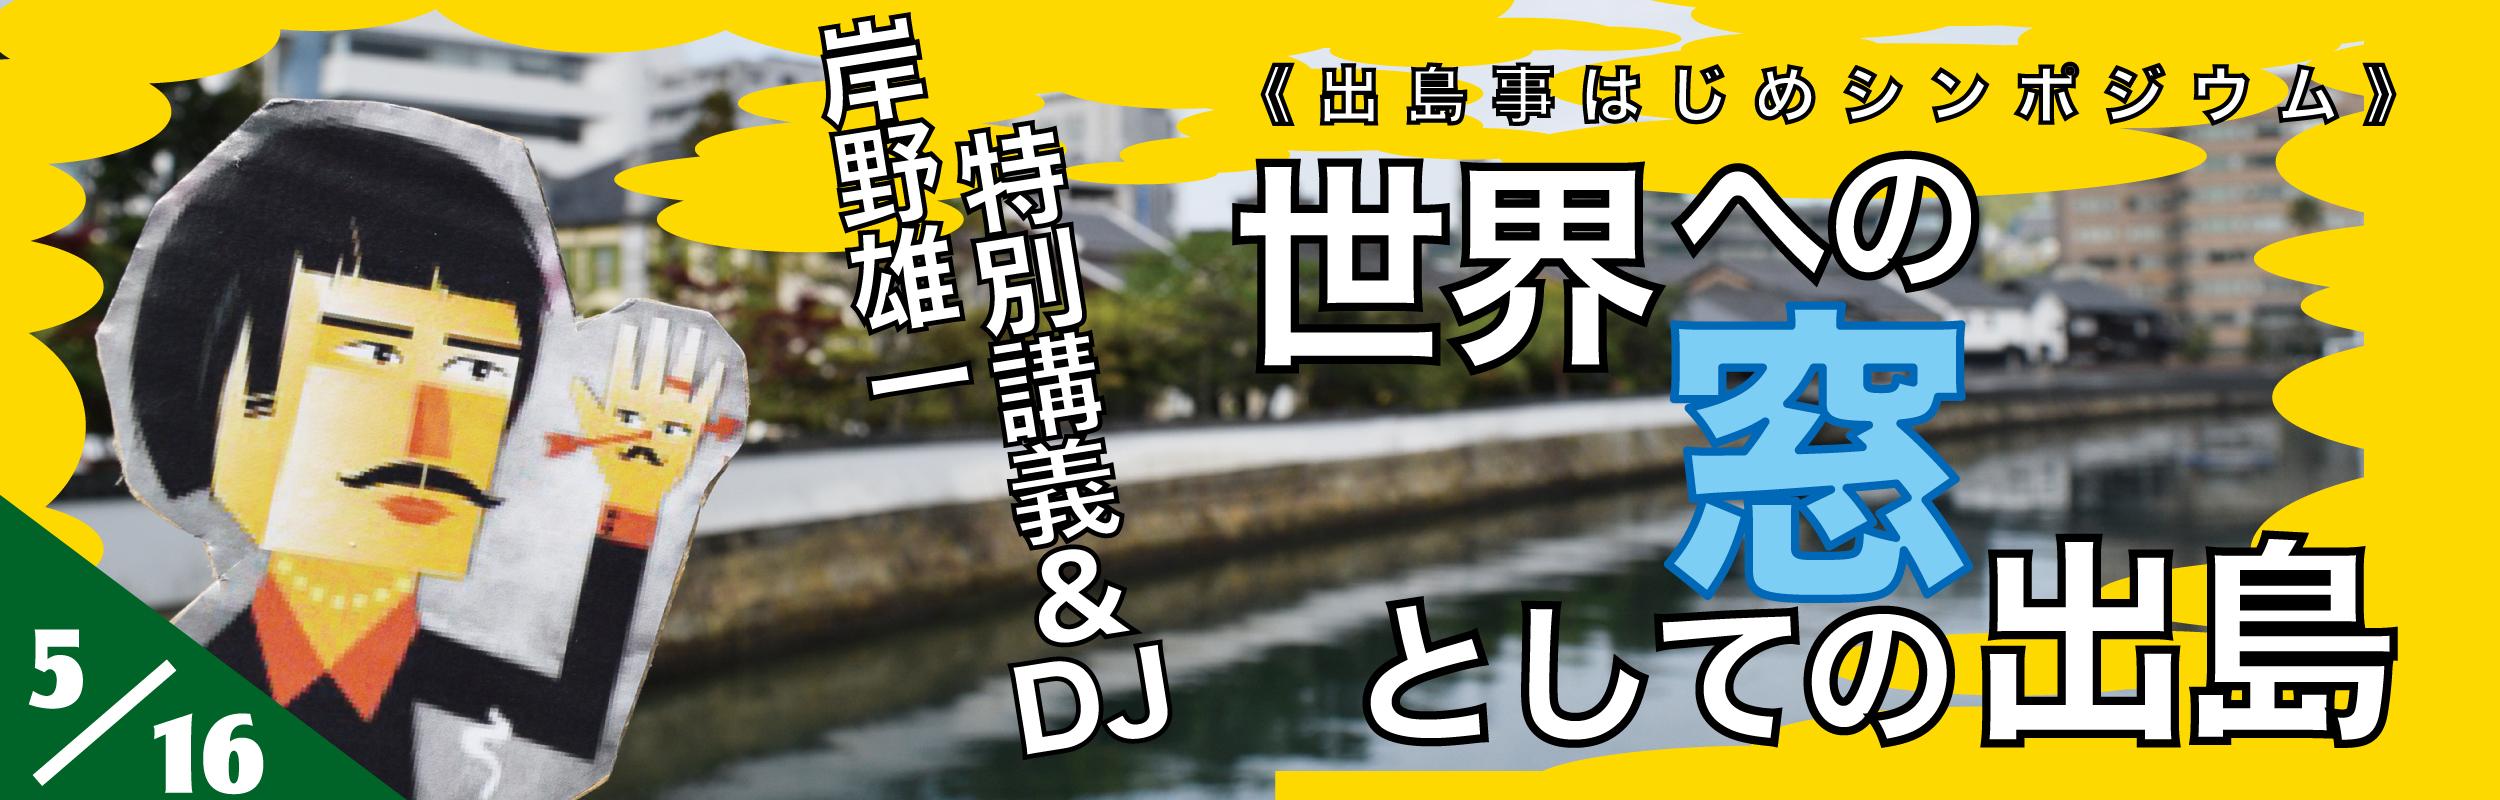 20170516dejima_banner